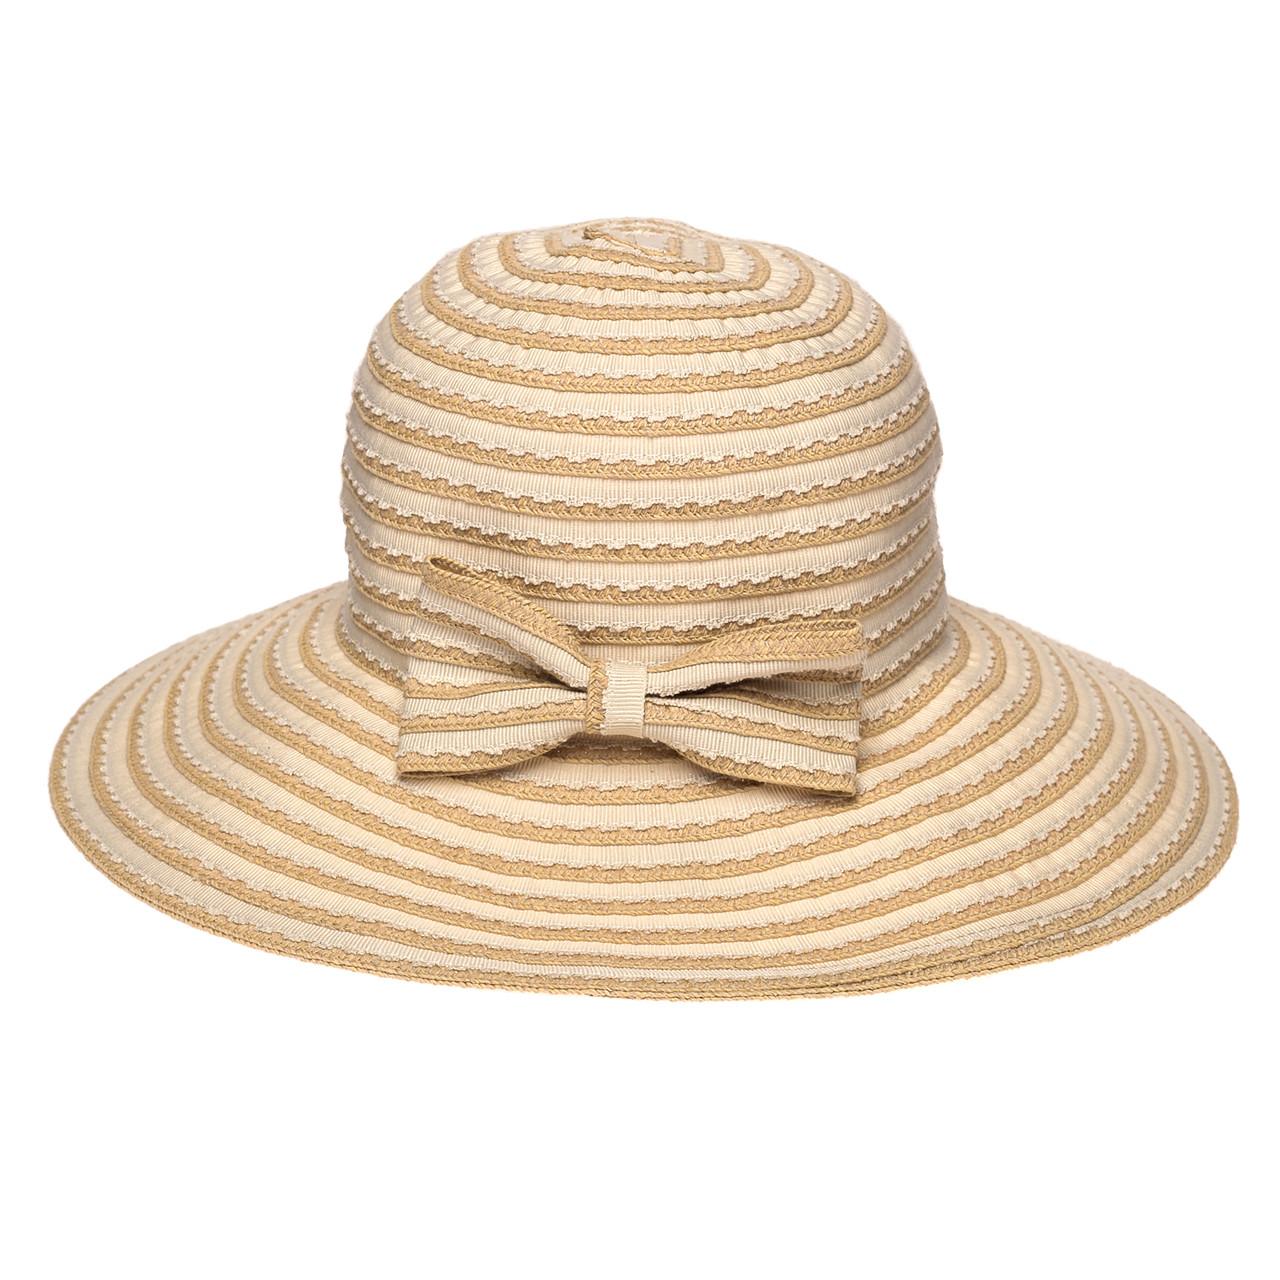 Шляпа женская Marmilen Тесьма-Бант бежевая ( AVKJX-128-02 )